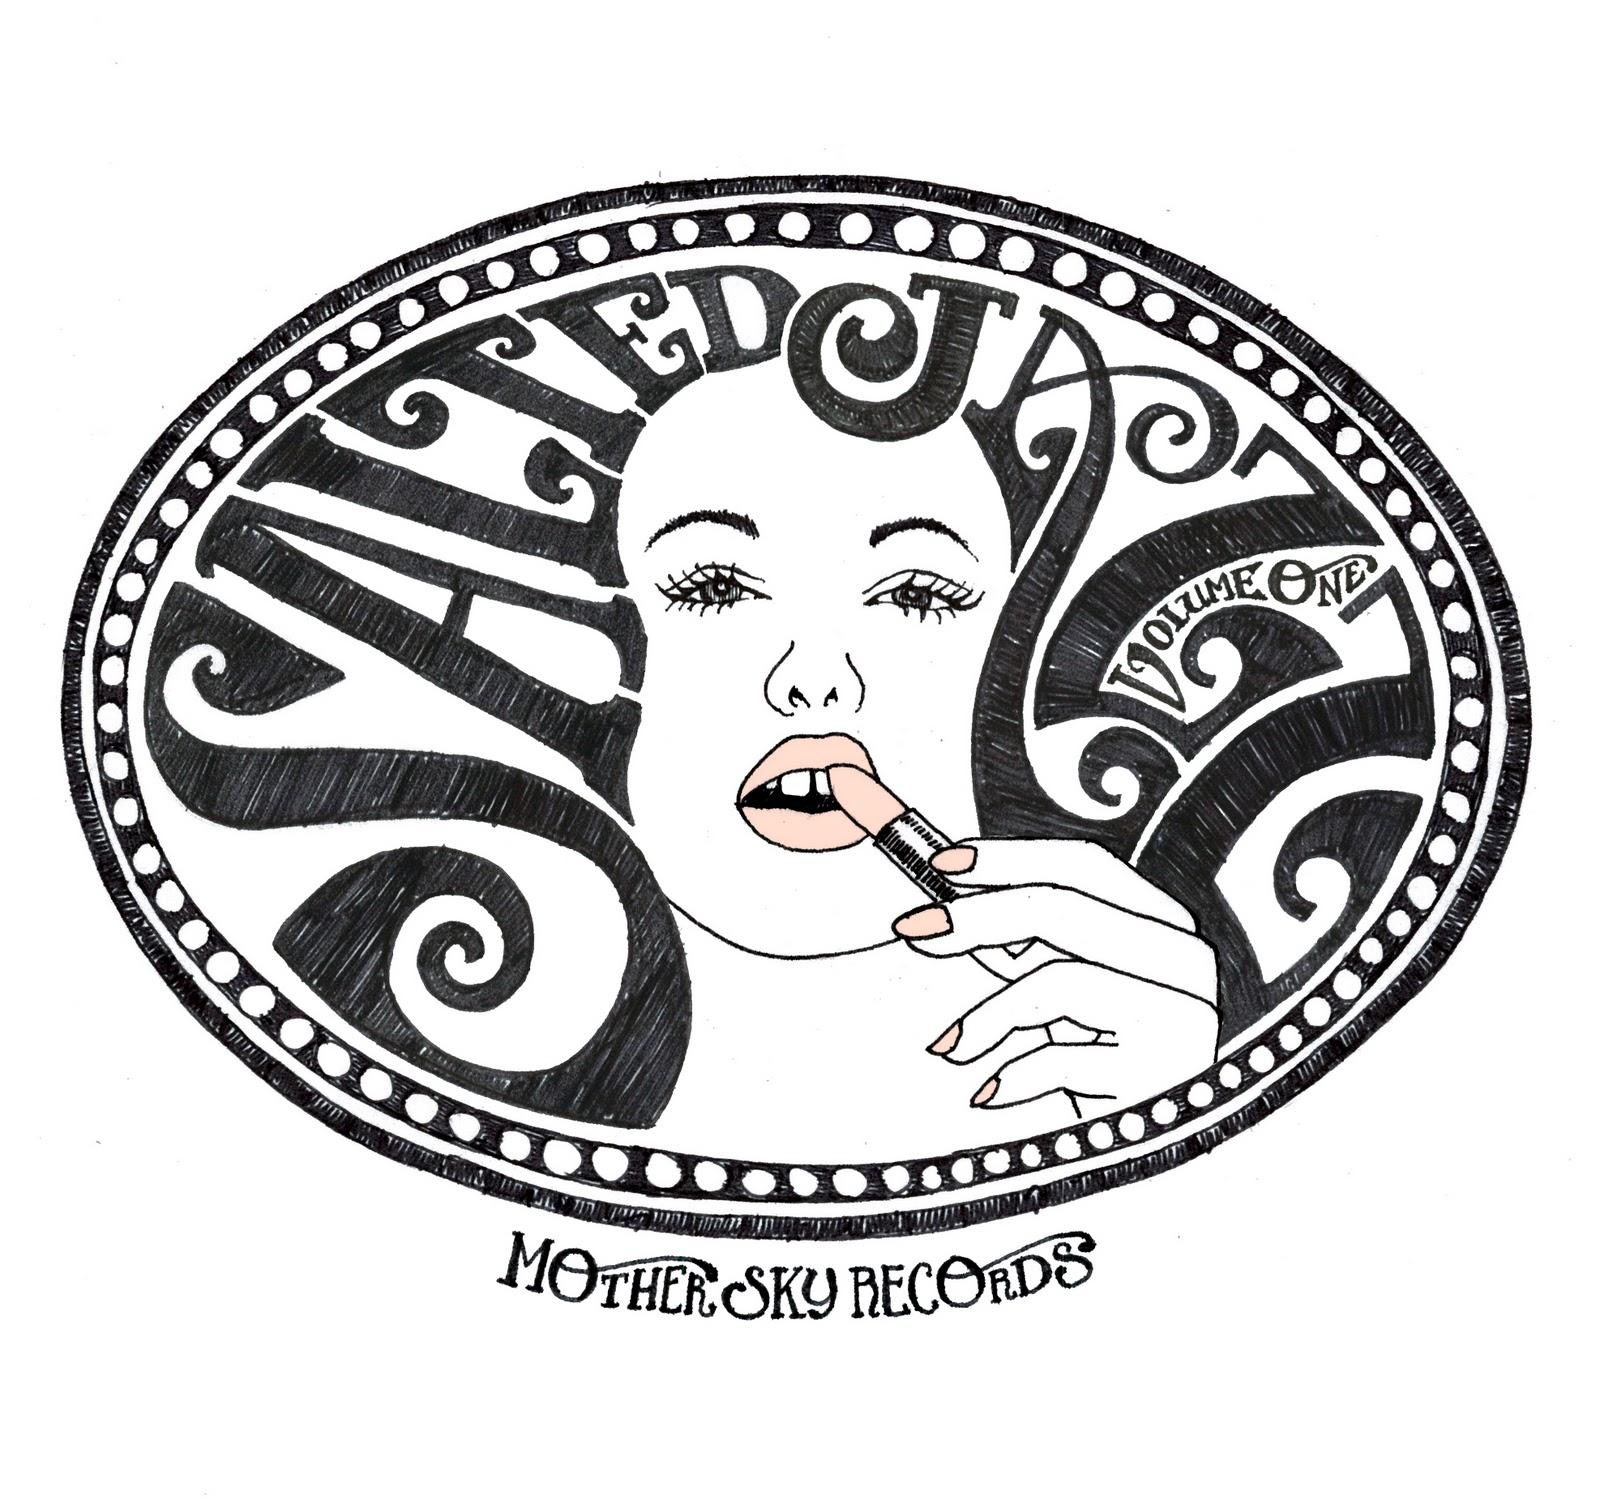 motherskyrecords: November 2010